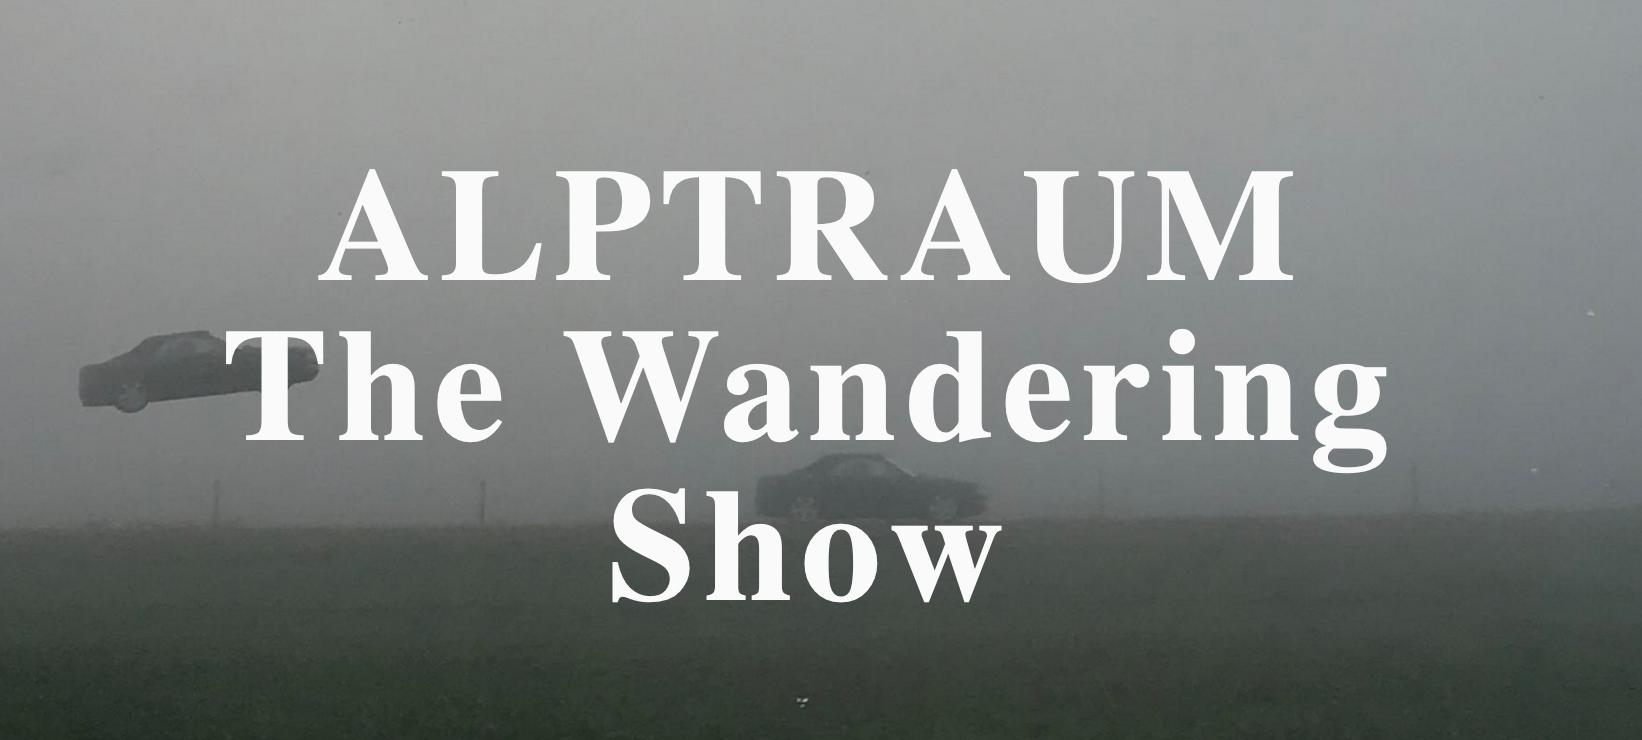 Alptraum The Wandering Show